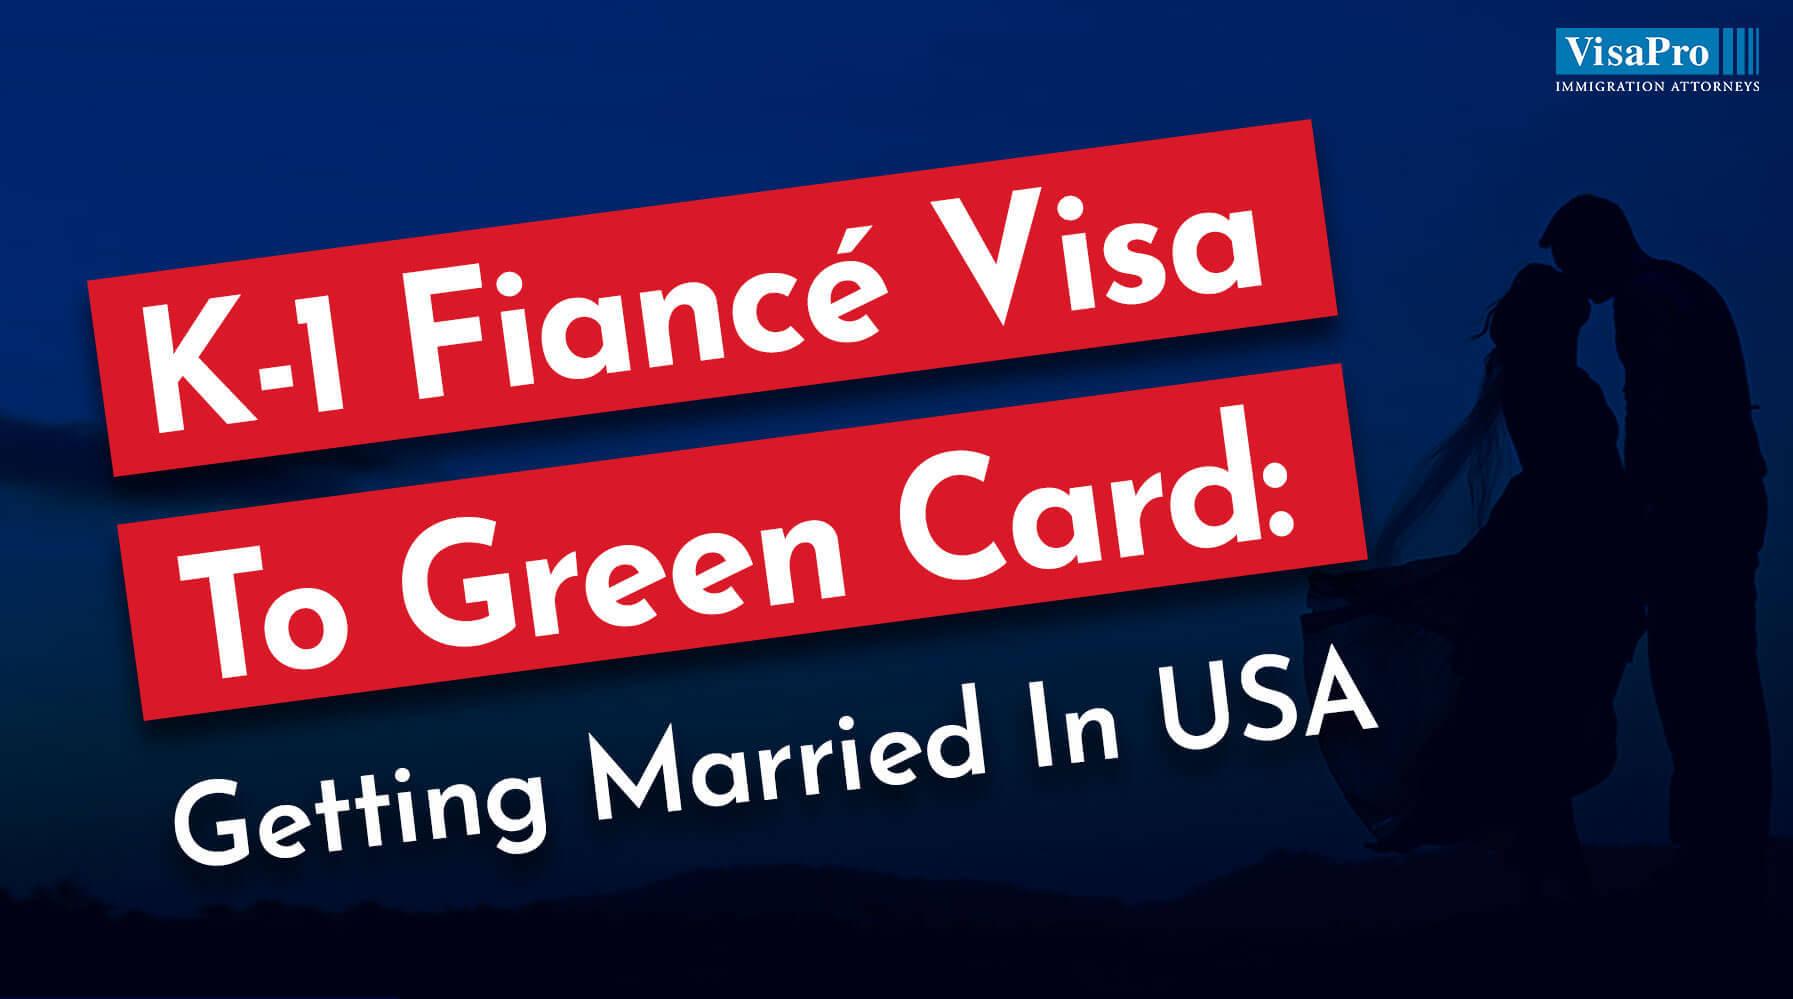 K1 Visa and Adjustment of Status Requirements